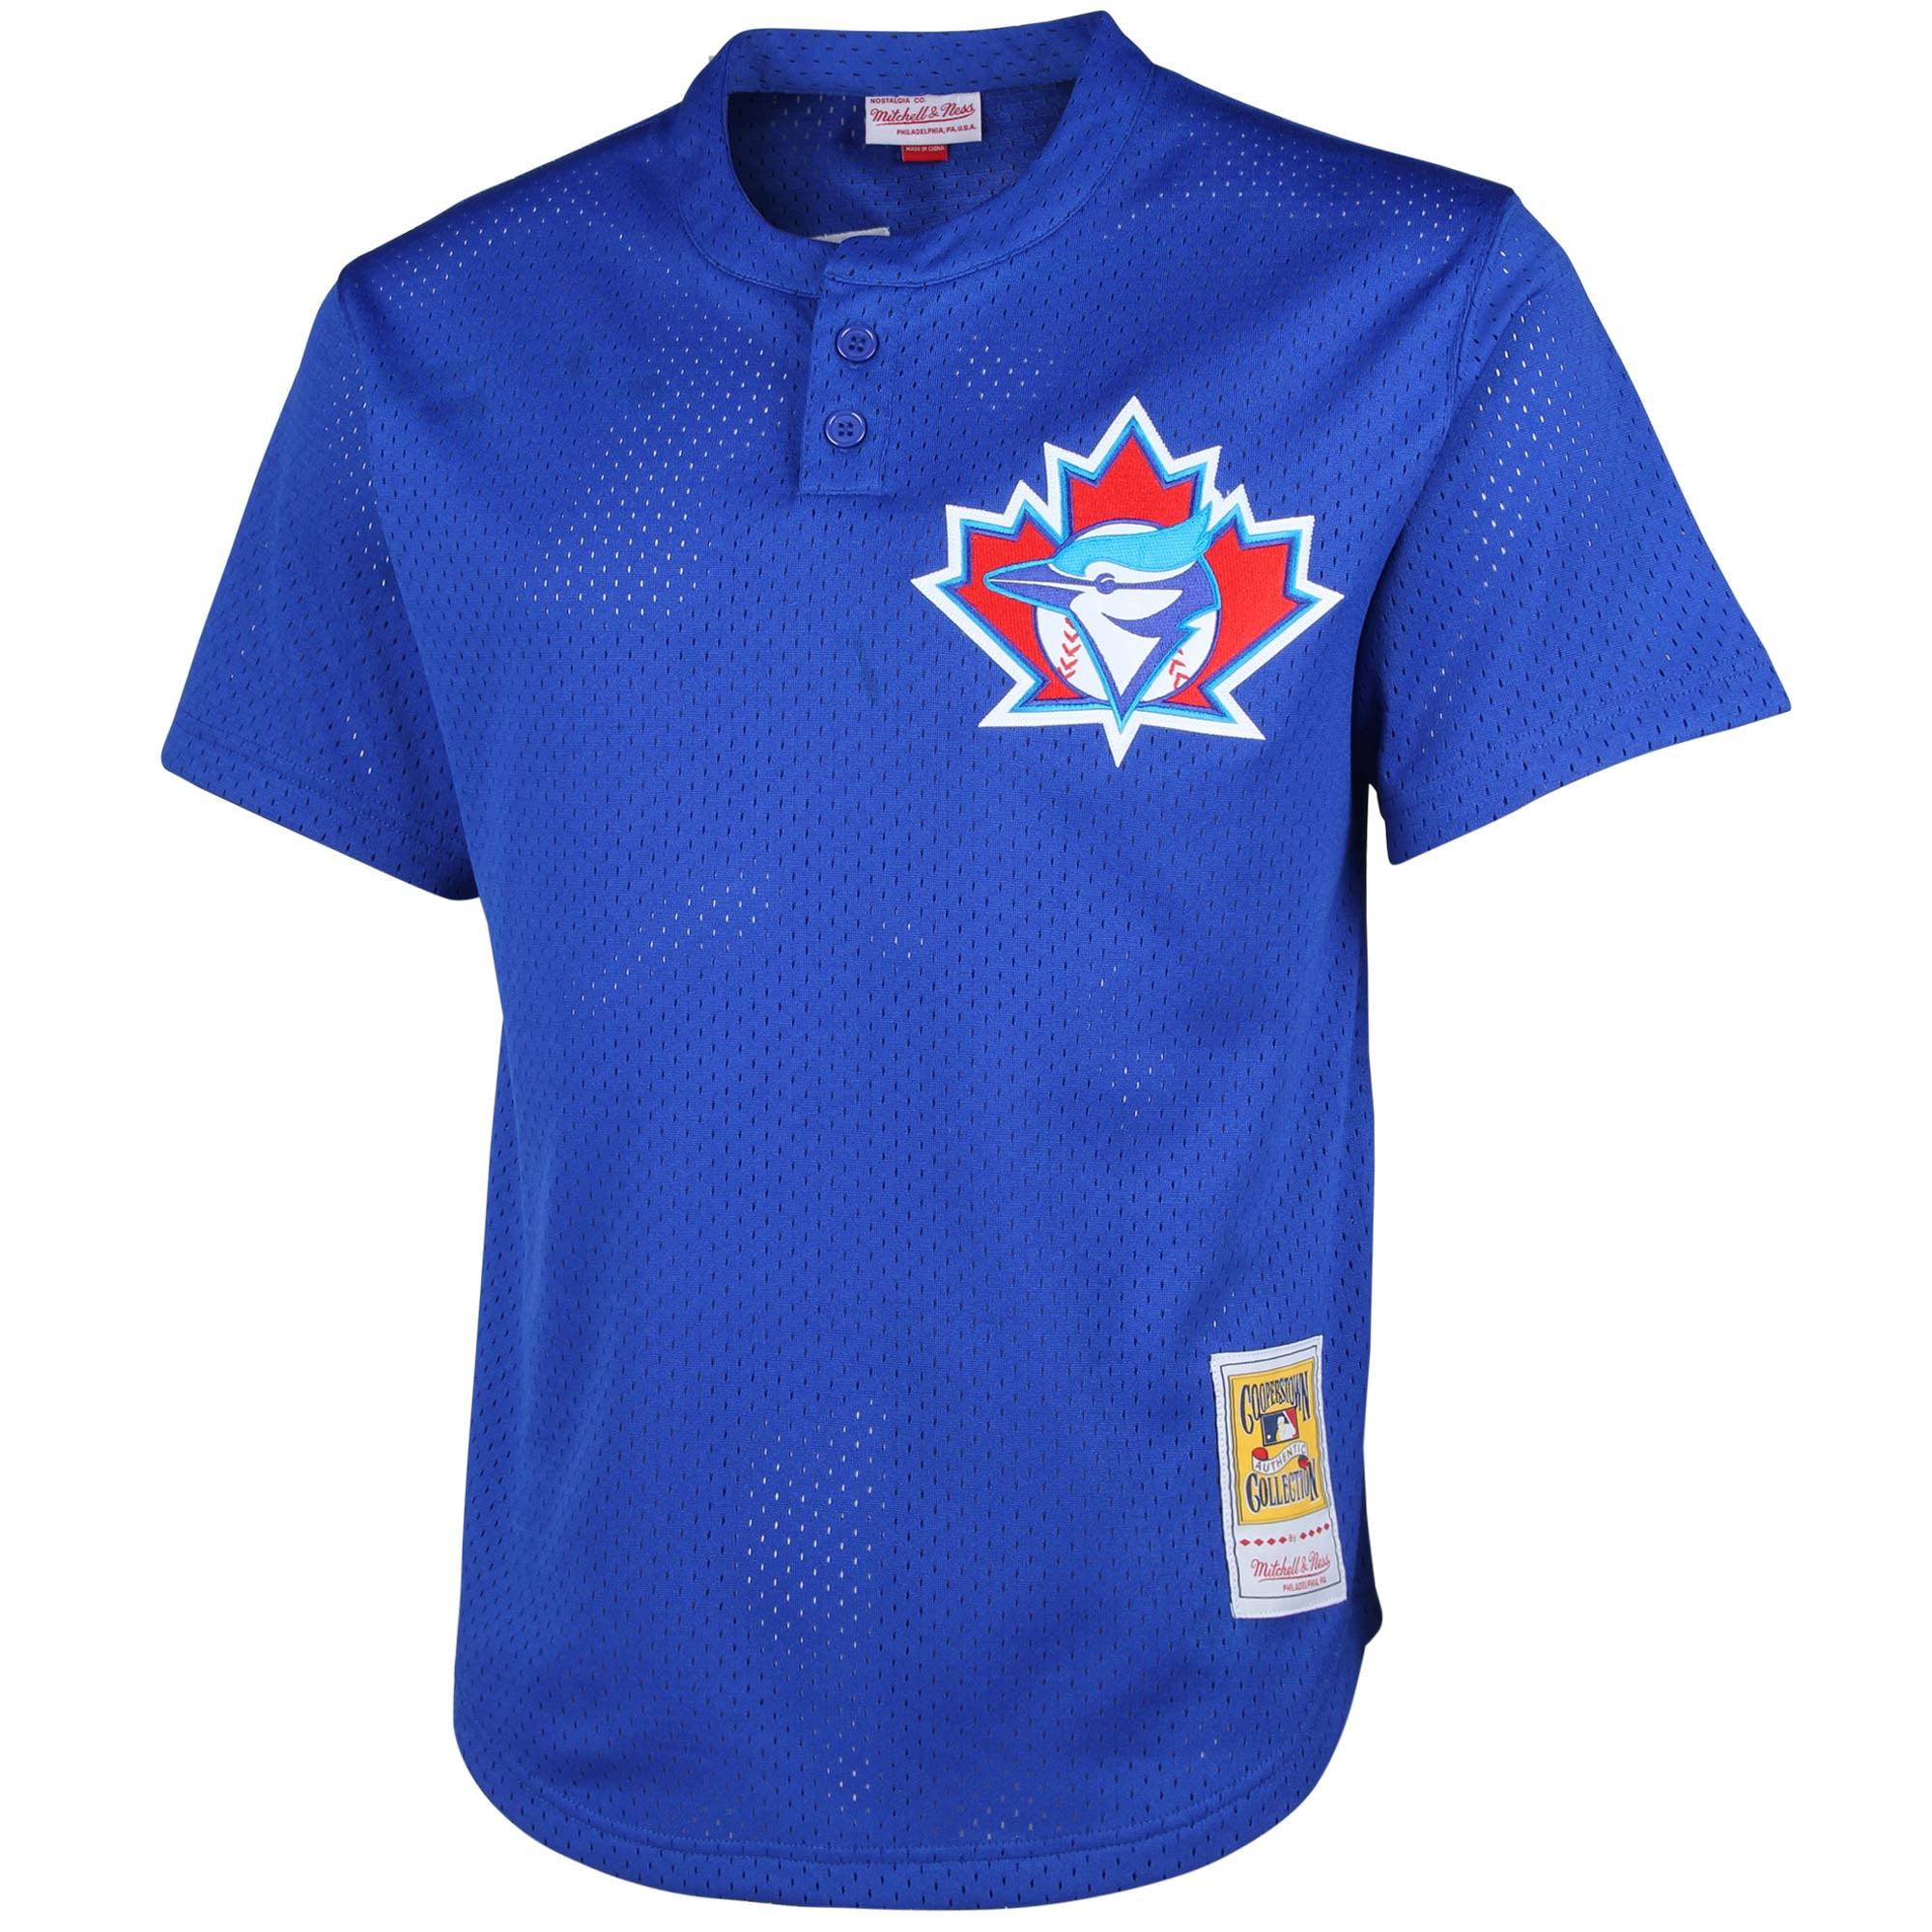 innovative design 17886 31b81 1997 Joe Carter Toronto Blue Jays Mitchell & Ness Cooperstown Mesh Batting  Practice Jersey - Royal